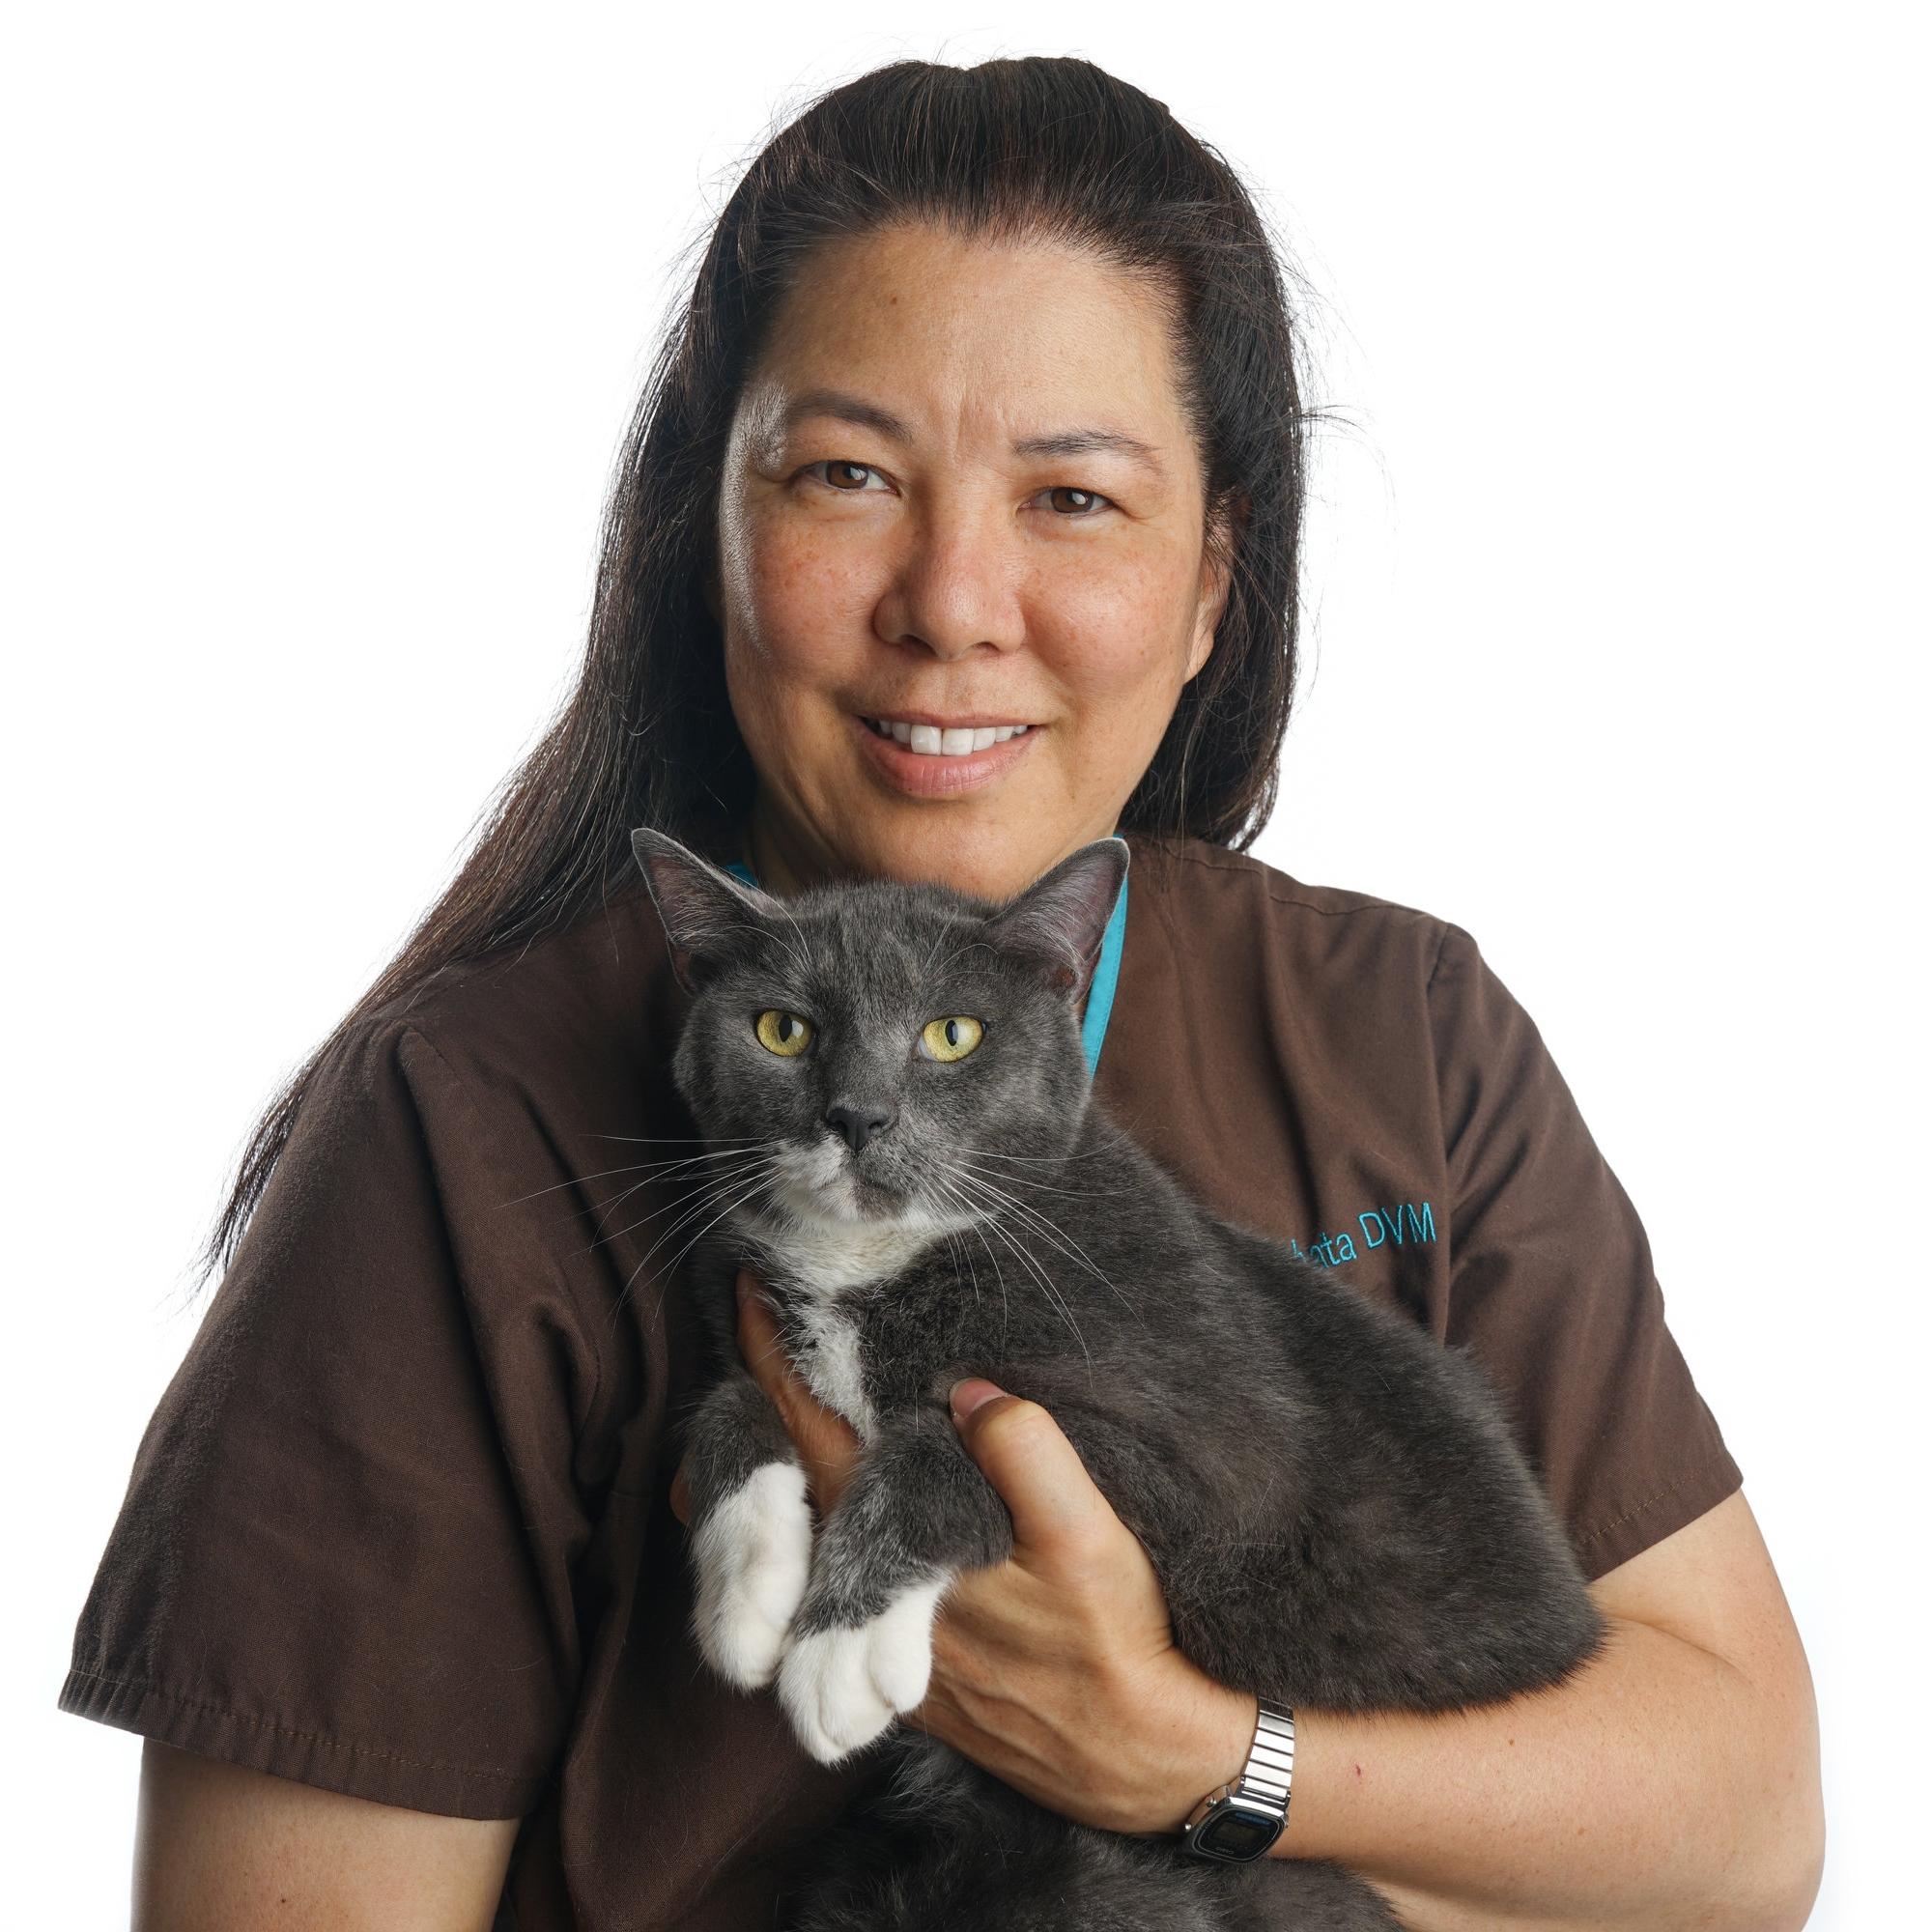 Dr. Lianne Tabata